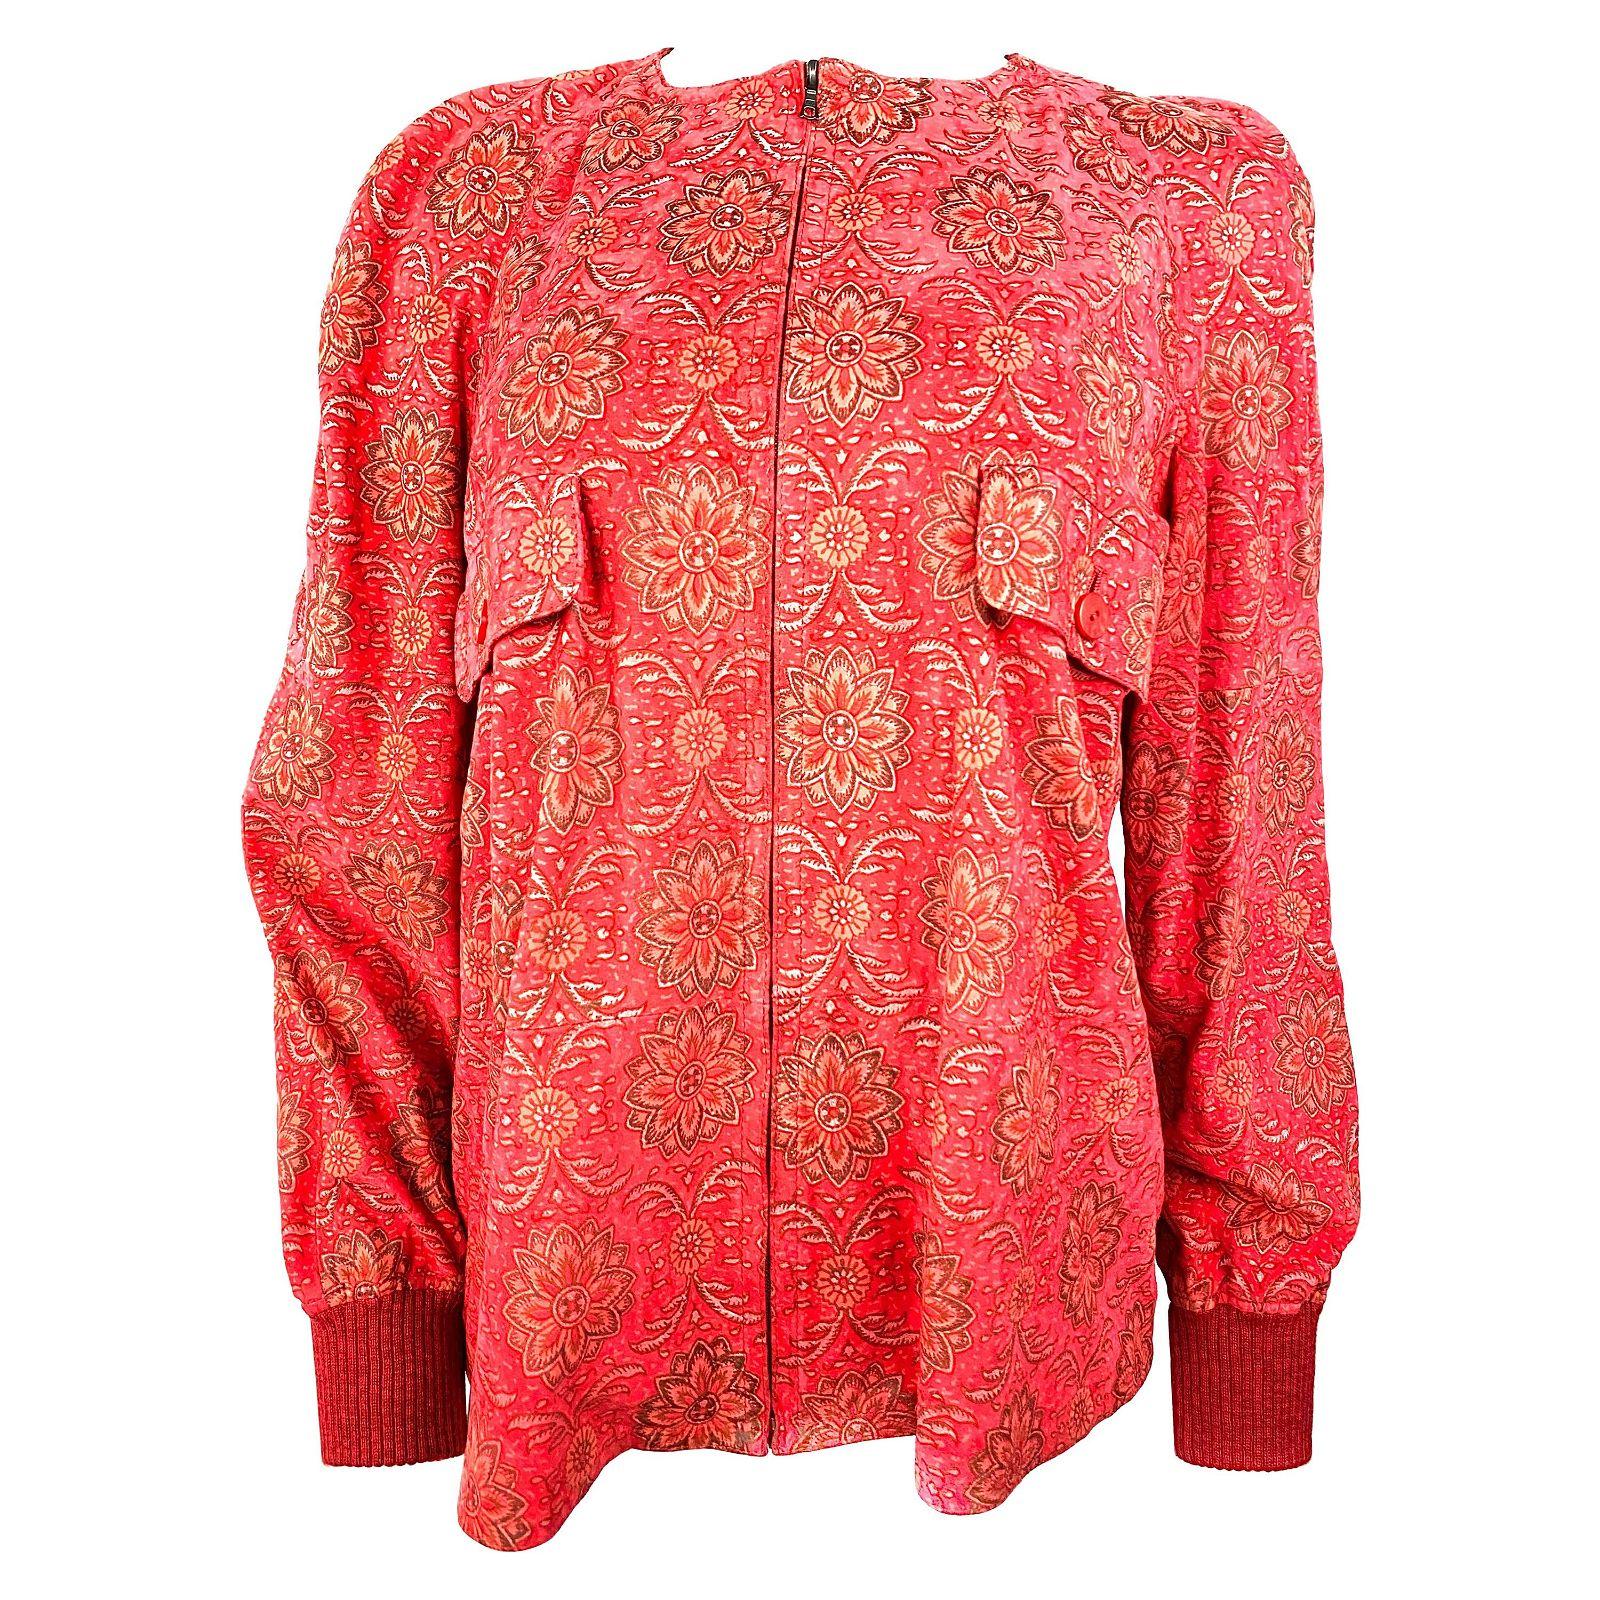 Valentino Red Suede Jacket Size 42